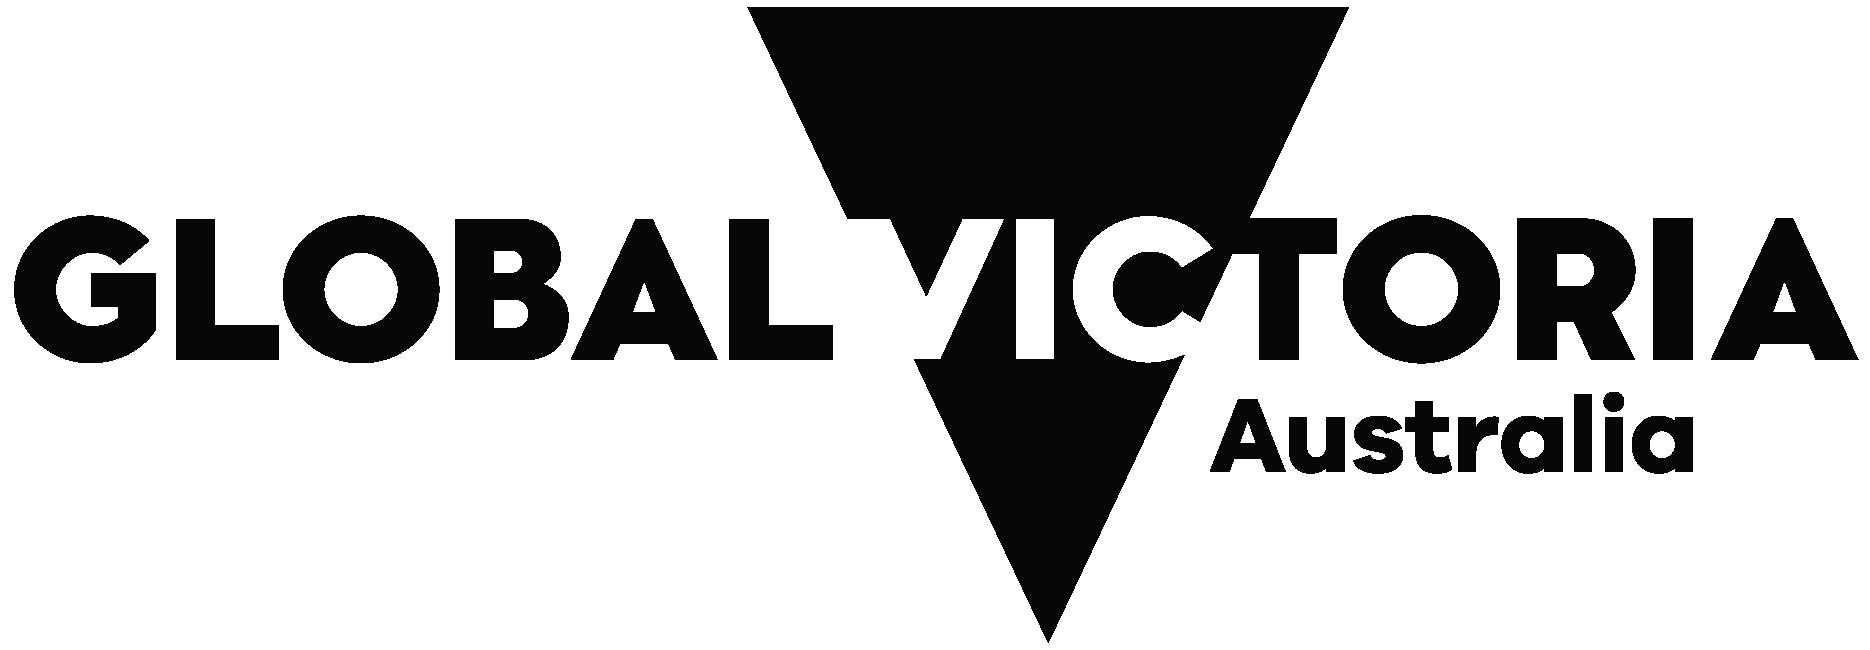 12026 DJPR Global Victoria Australia Logo_CMYK_Global Victoria Australia Logo Black CMYK